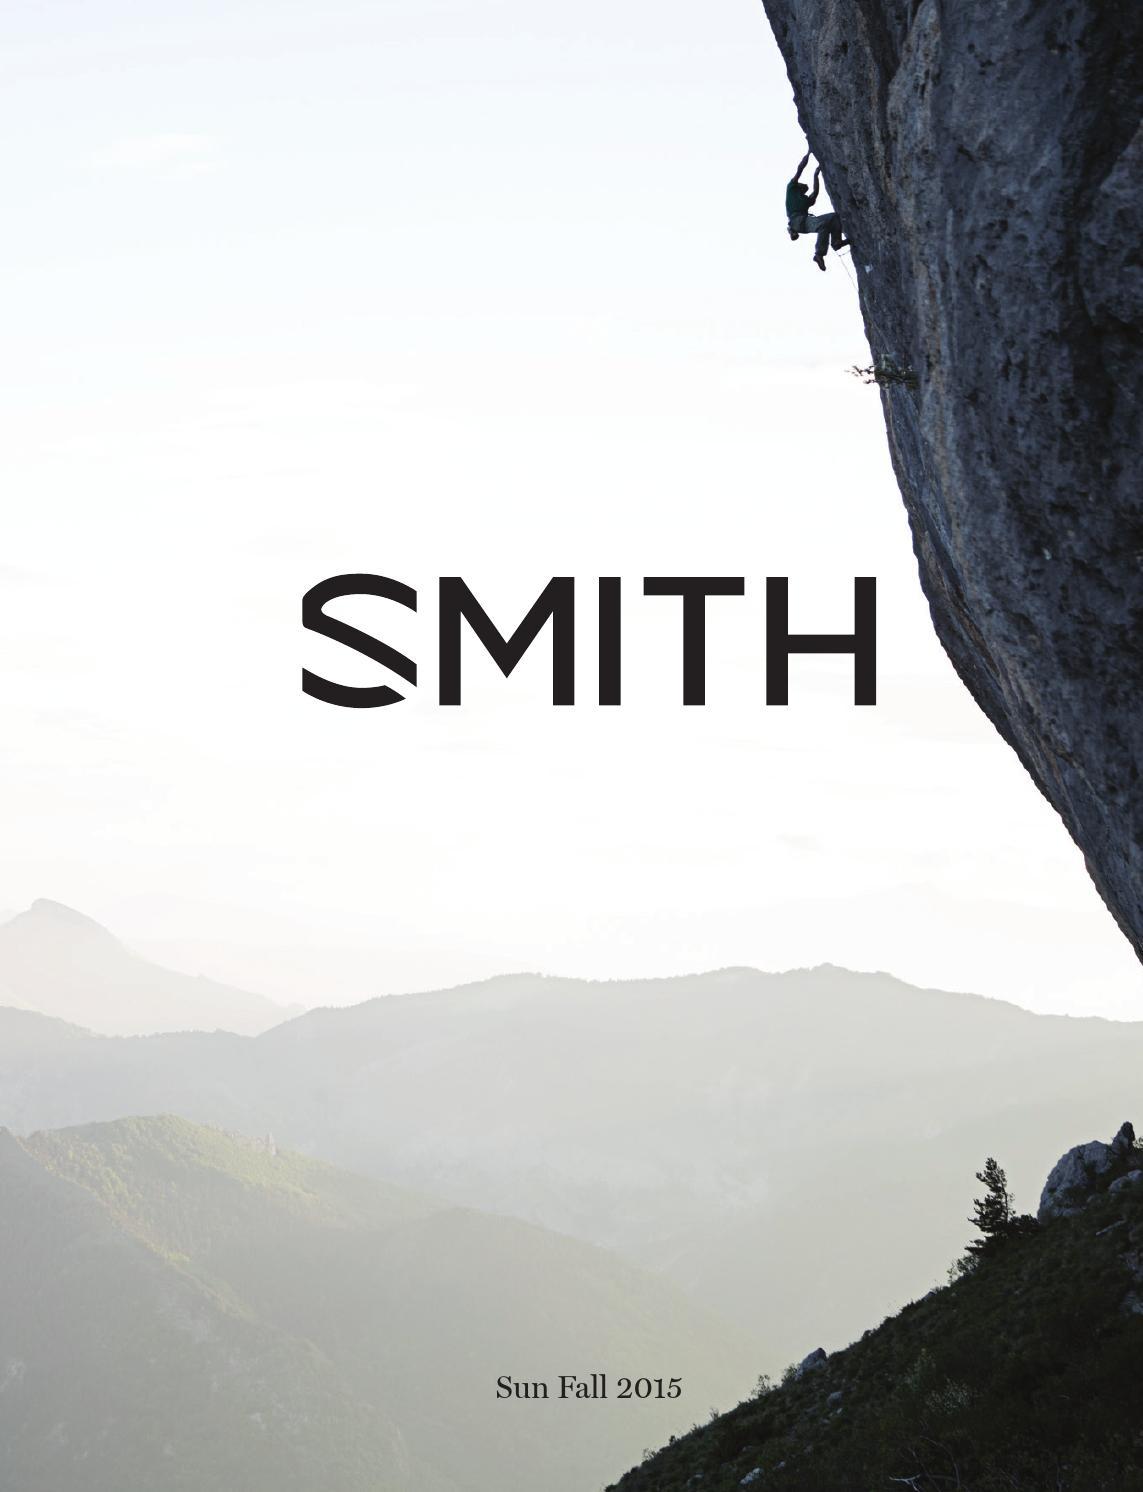 eec0c267c58 SMITH FALL 2015 SUNGLASS CATALOG by Smith - issuu